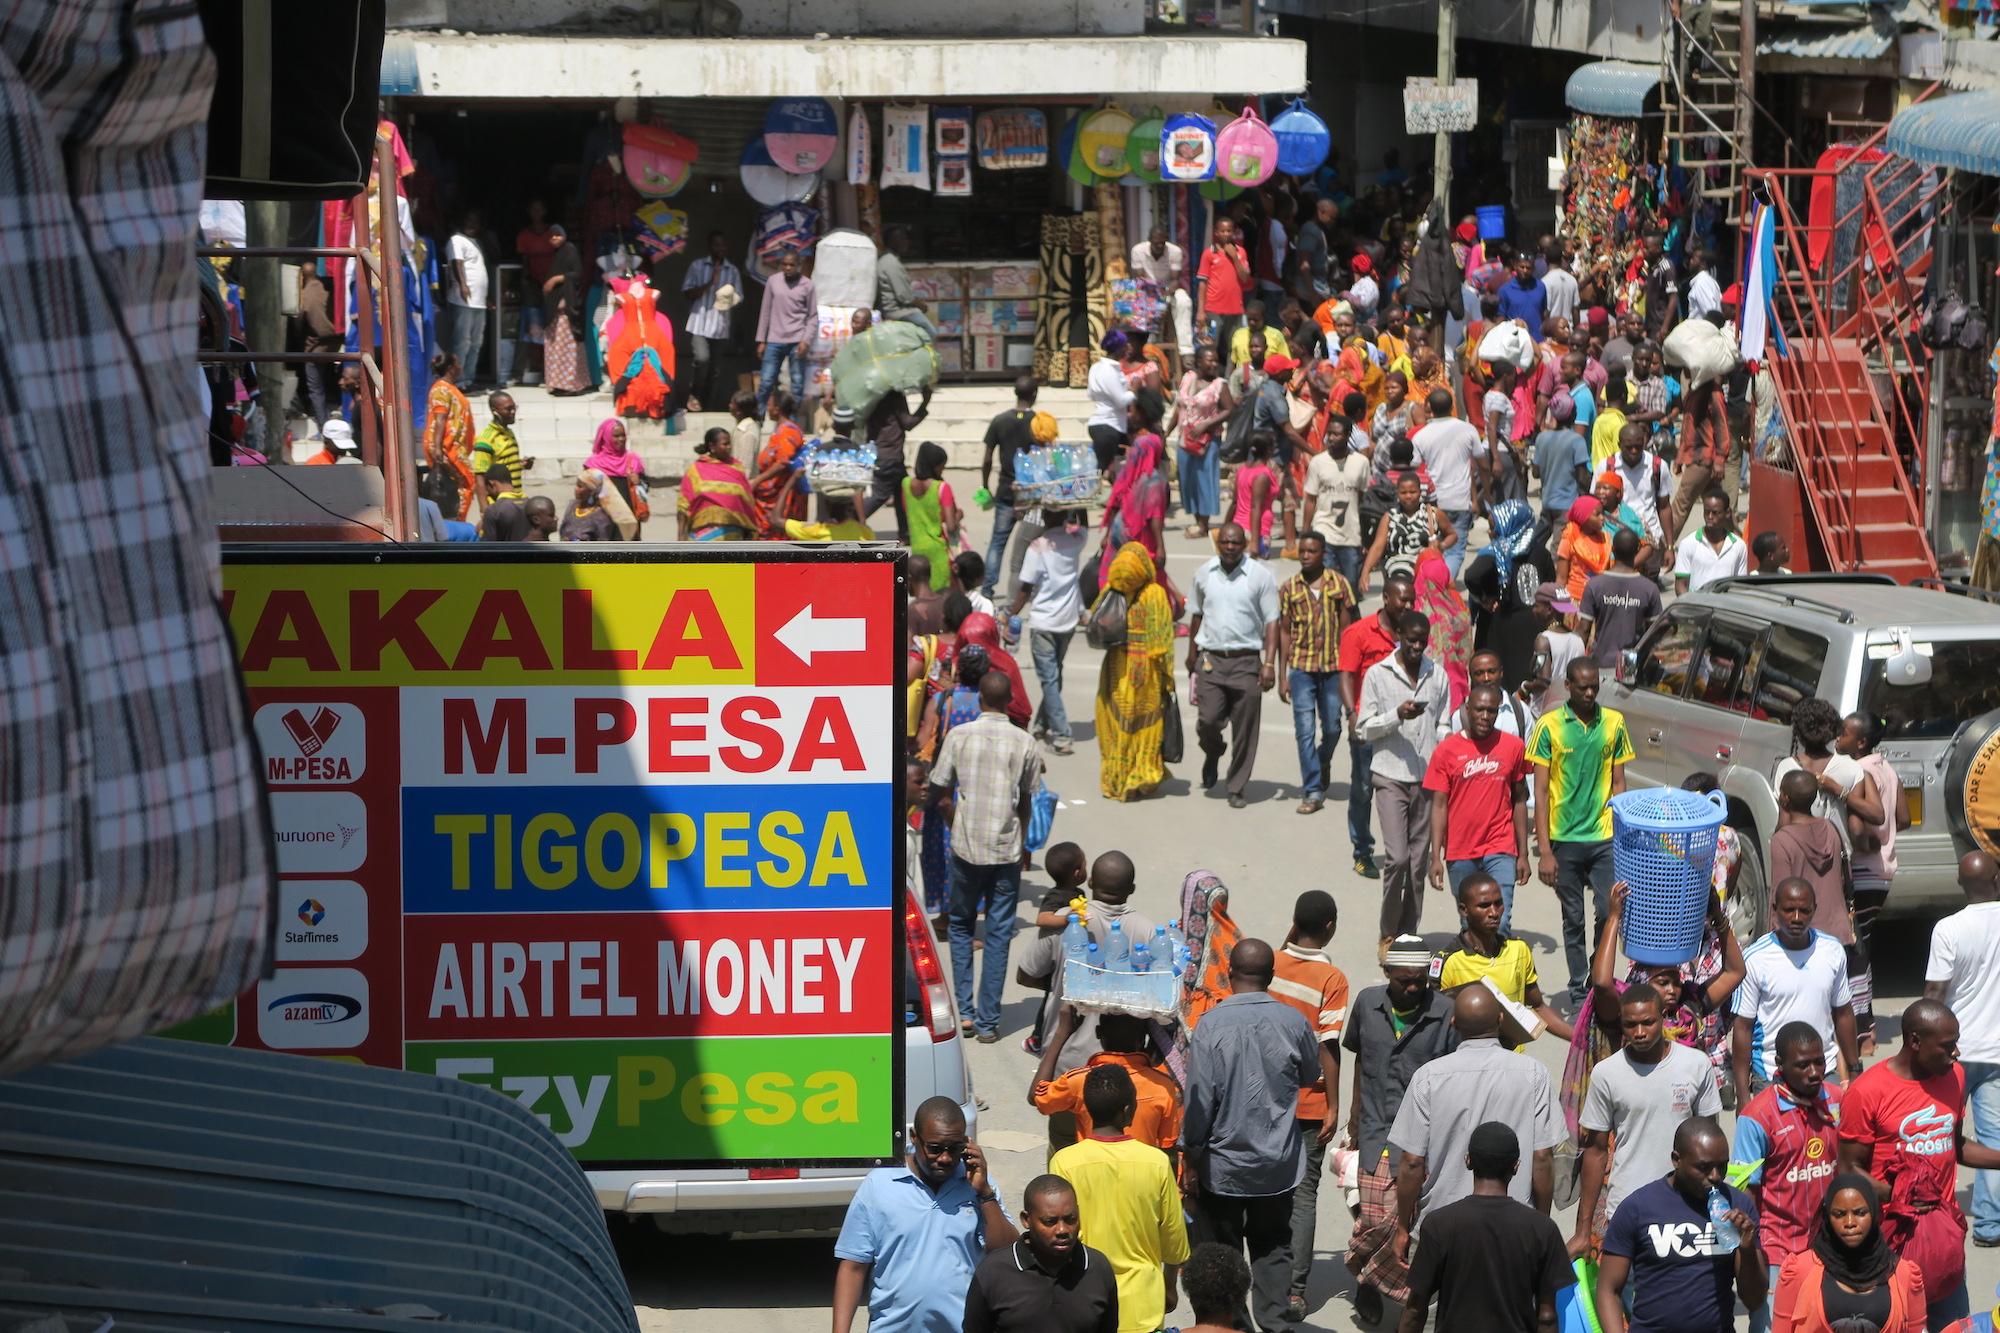 Tanzanian-market-mobilemoney